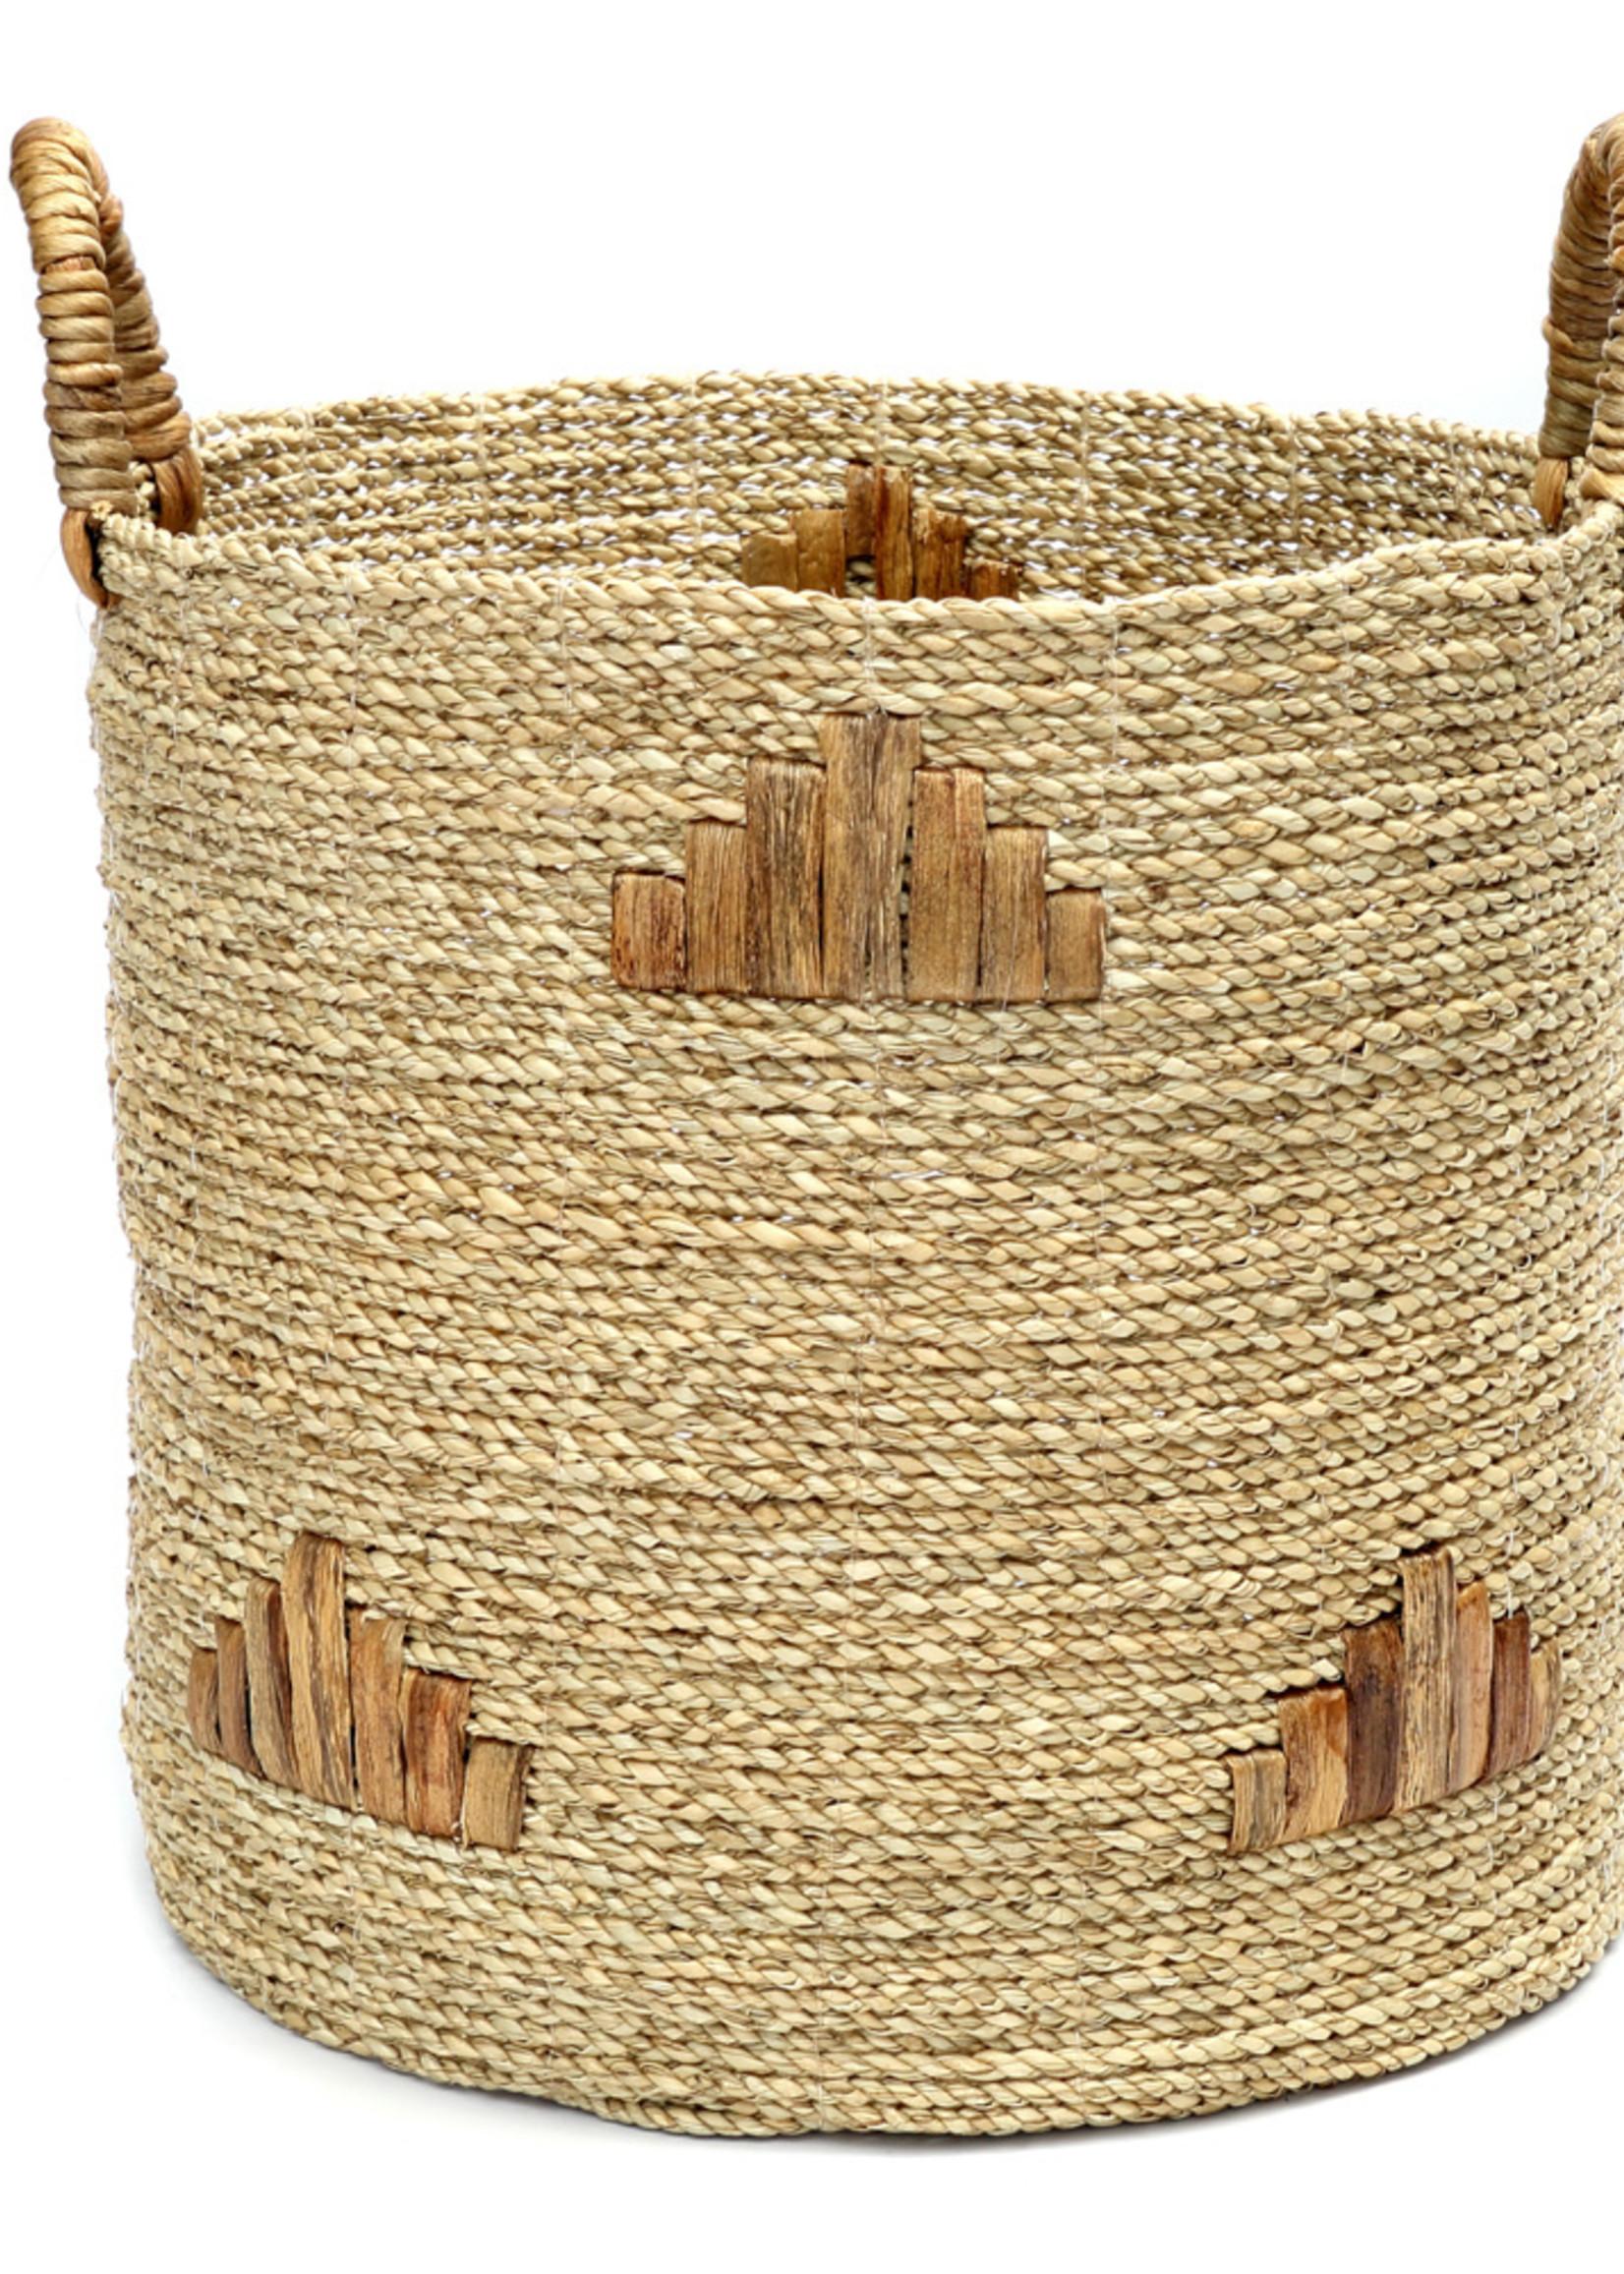 The Twiggy Graphic Baskets - Set 3